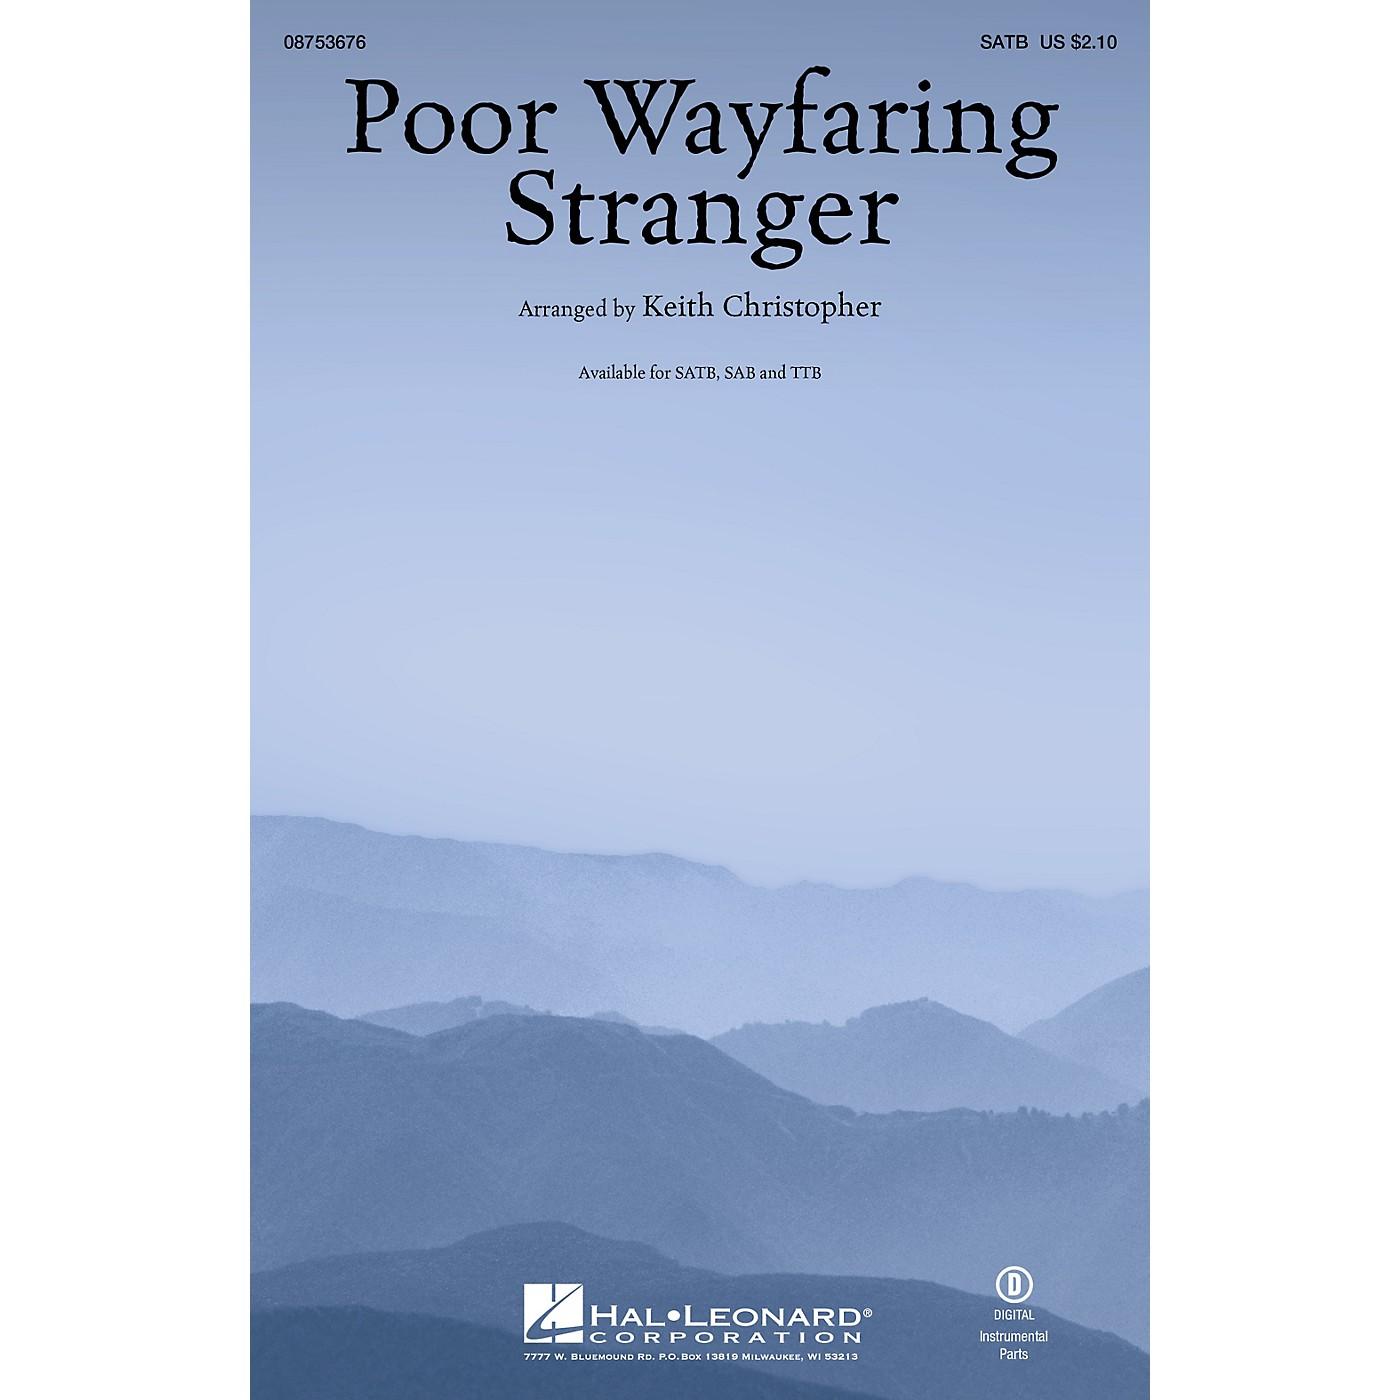 Hal Leonard Poor Wayfaring Stranger TTB Arranged by Keith Christopher thumbnail